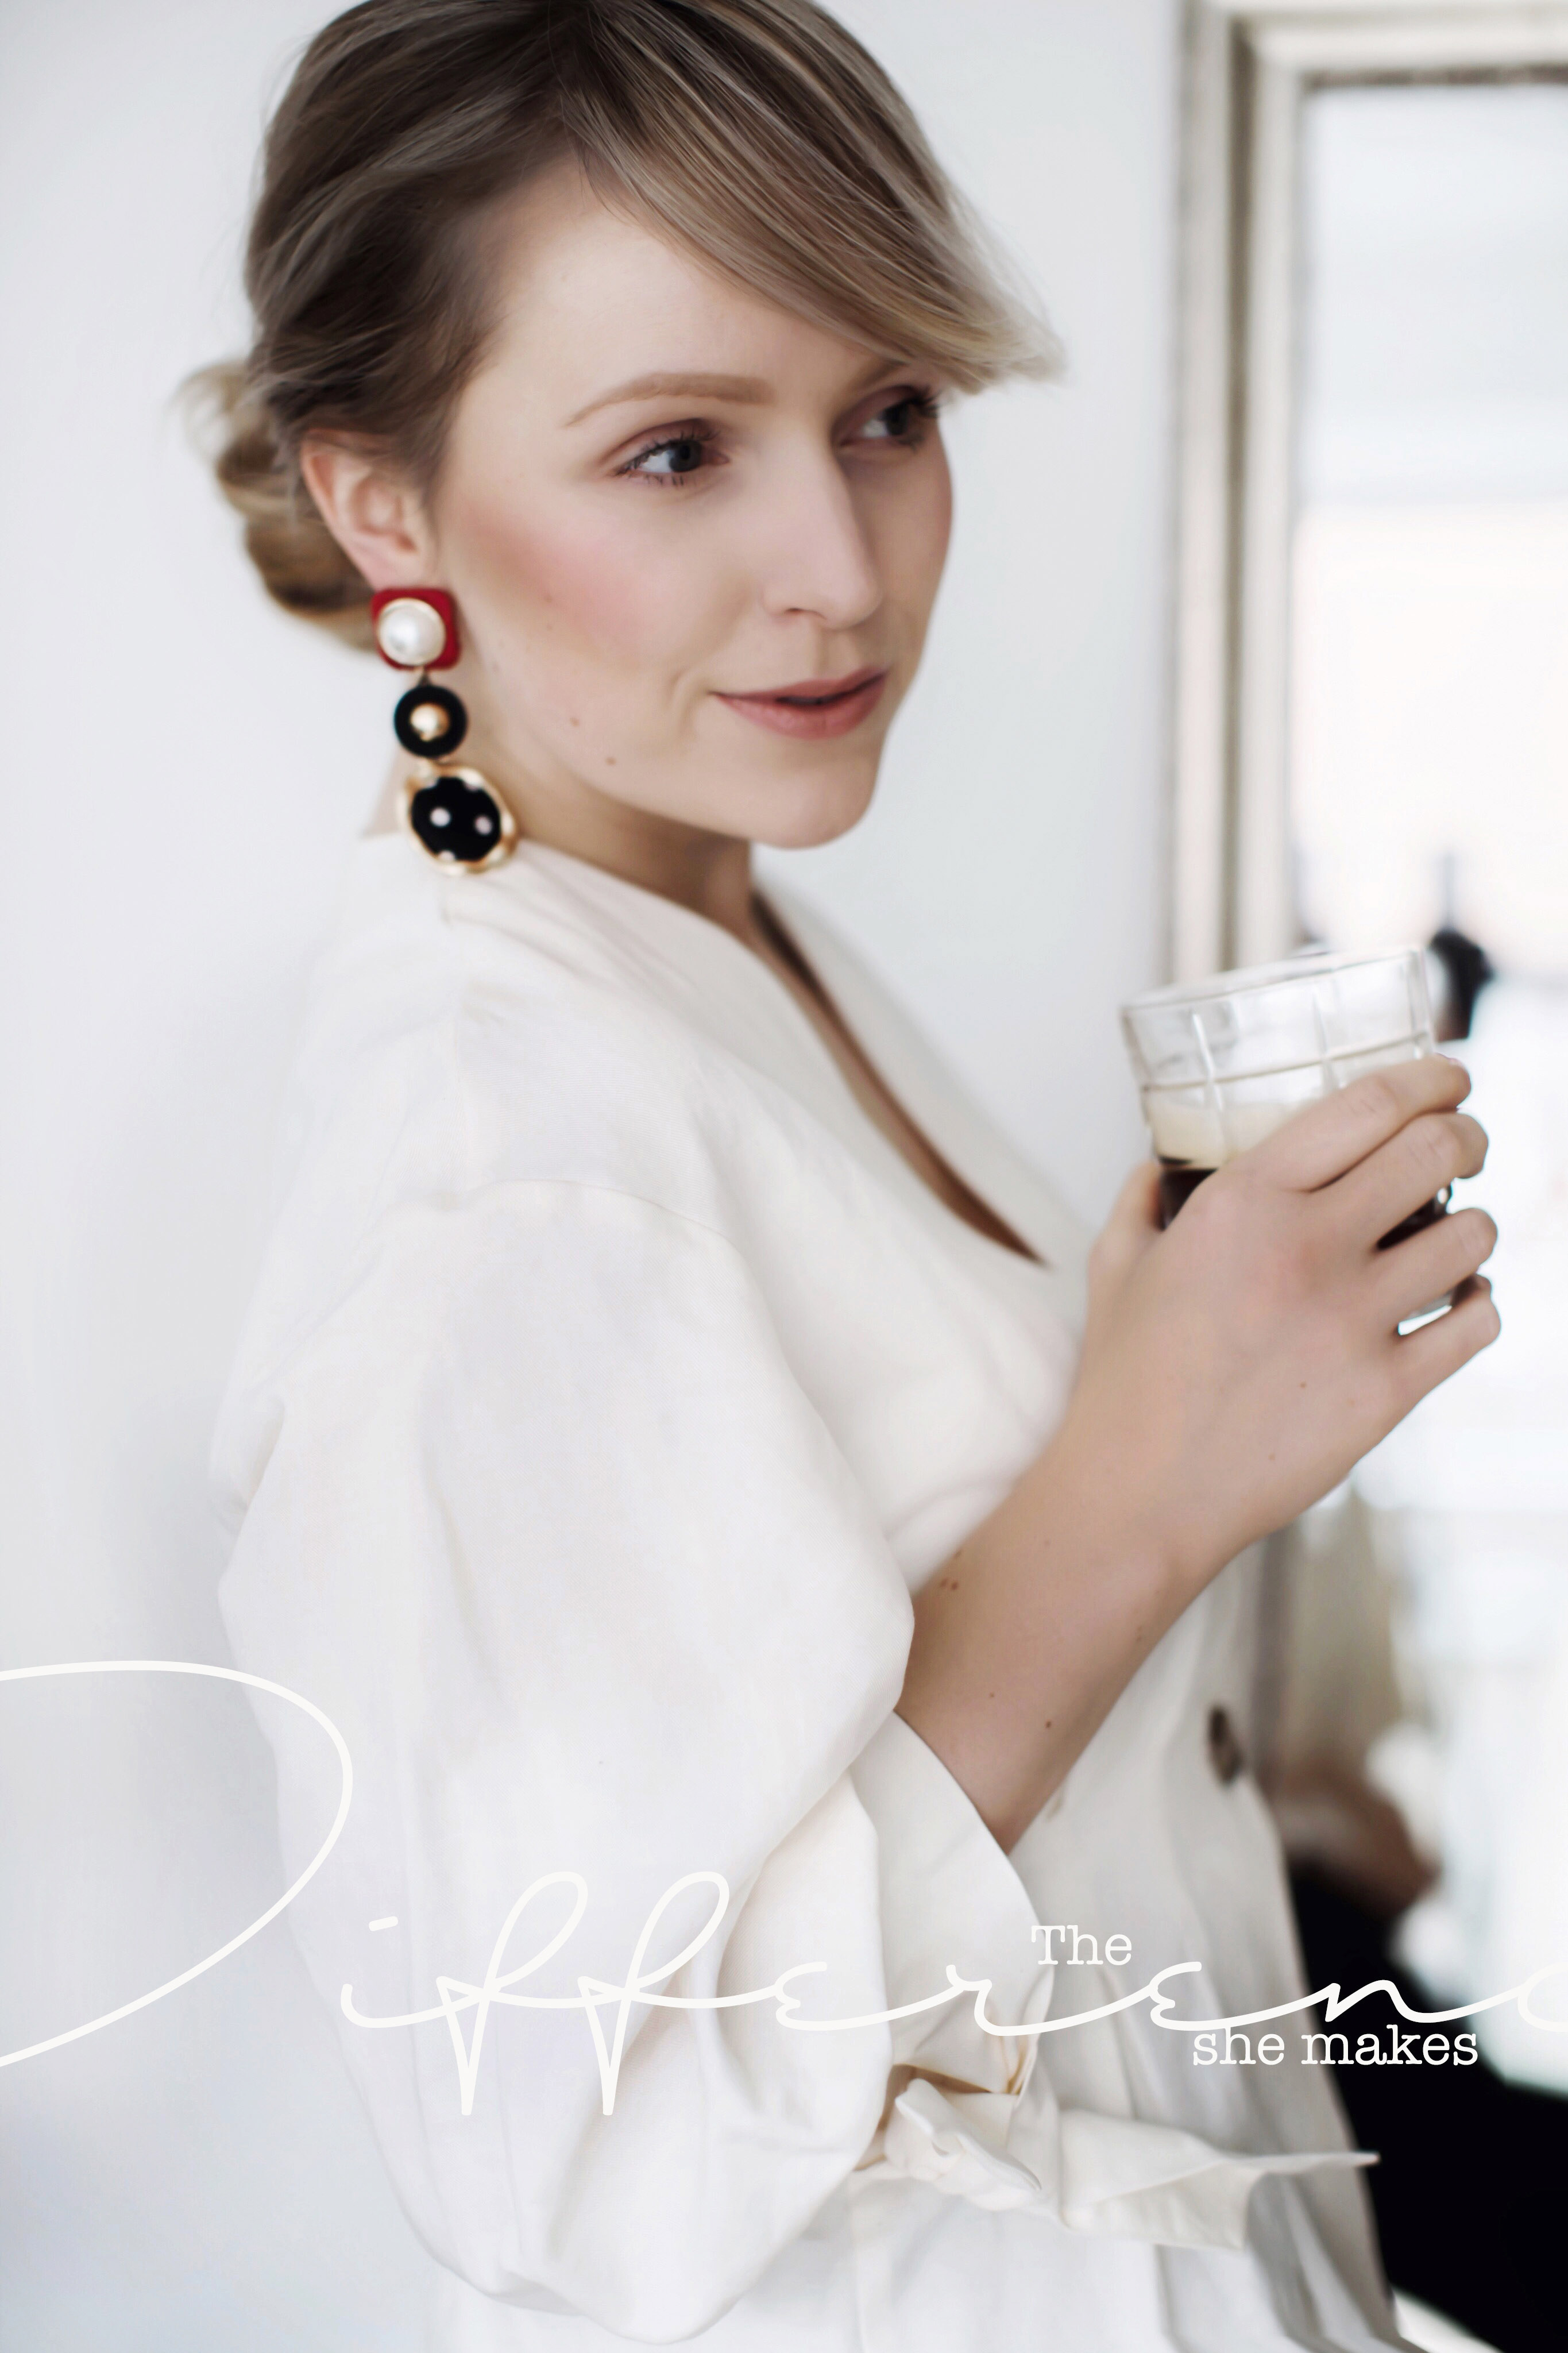 nespresso-emanzipation #TheDifferenceSheMakes - Welche Frau hat dich positiv beeinflusst?